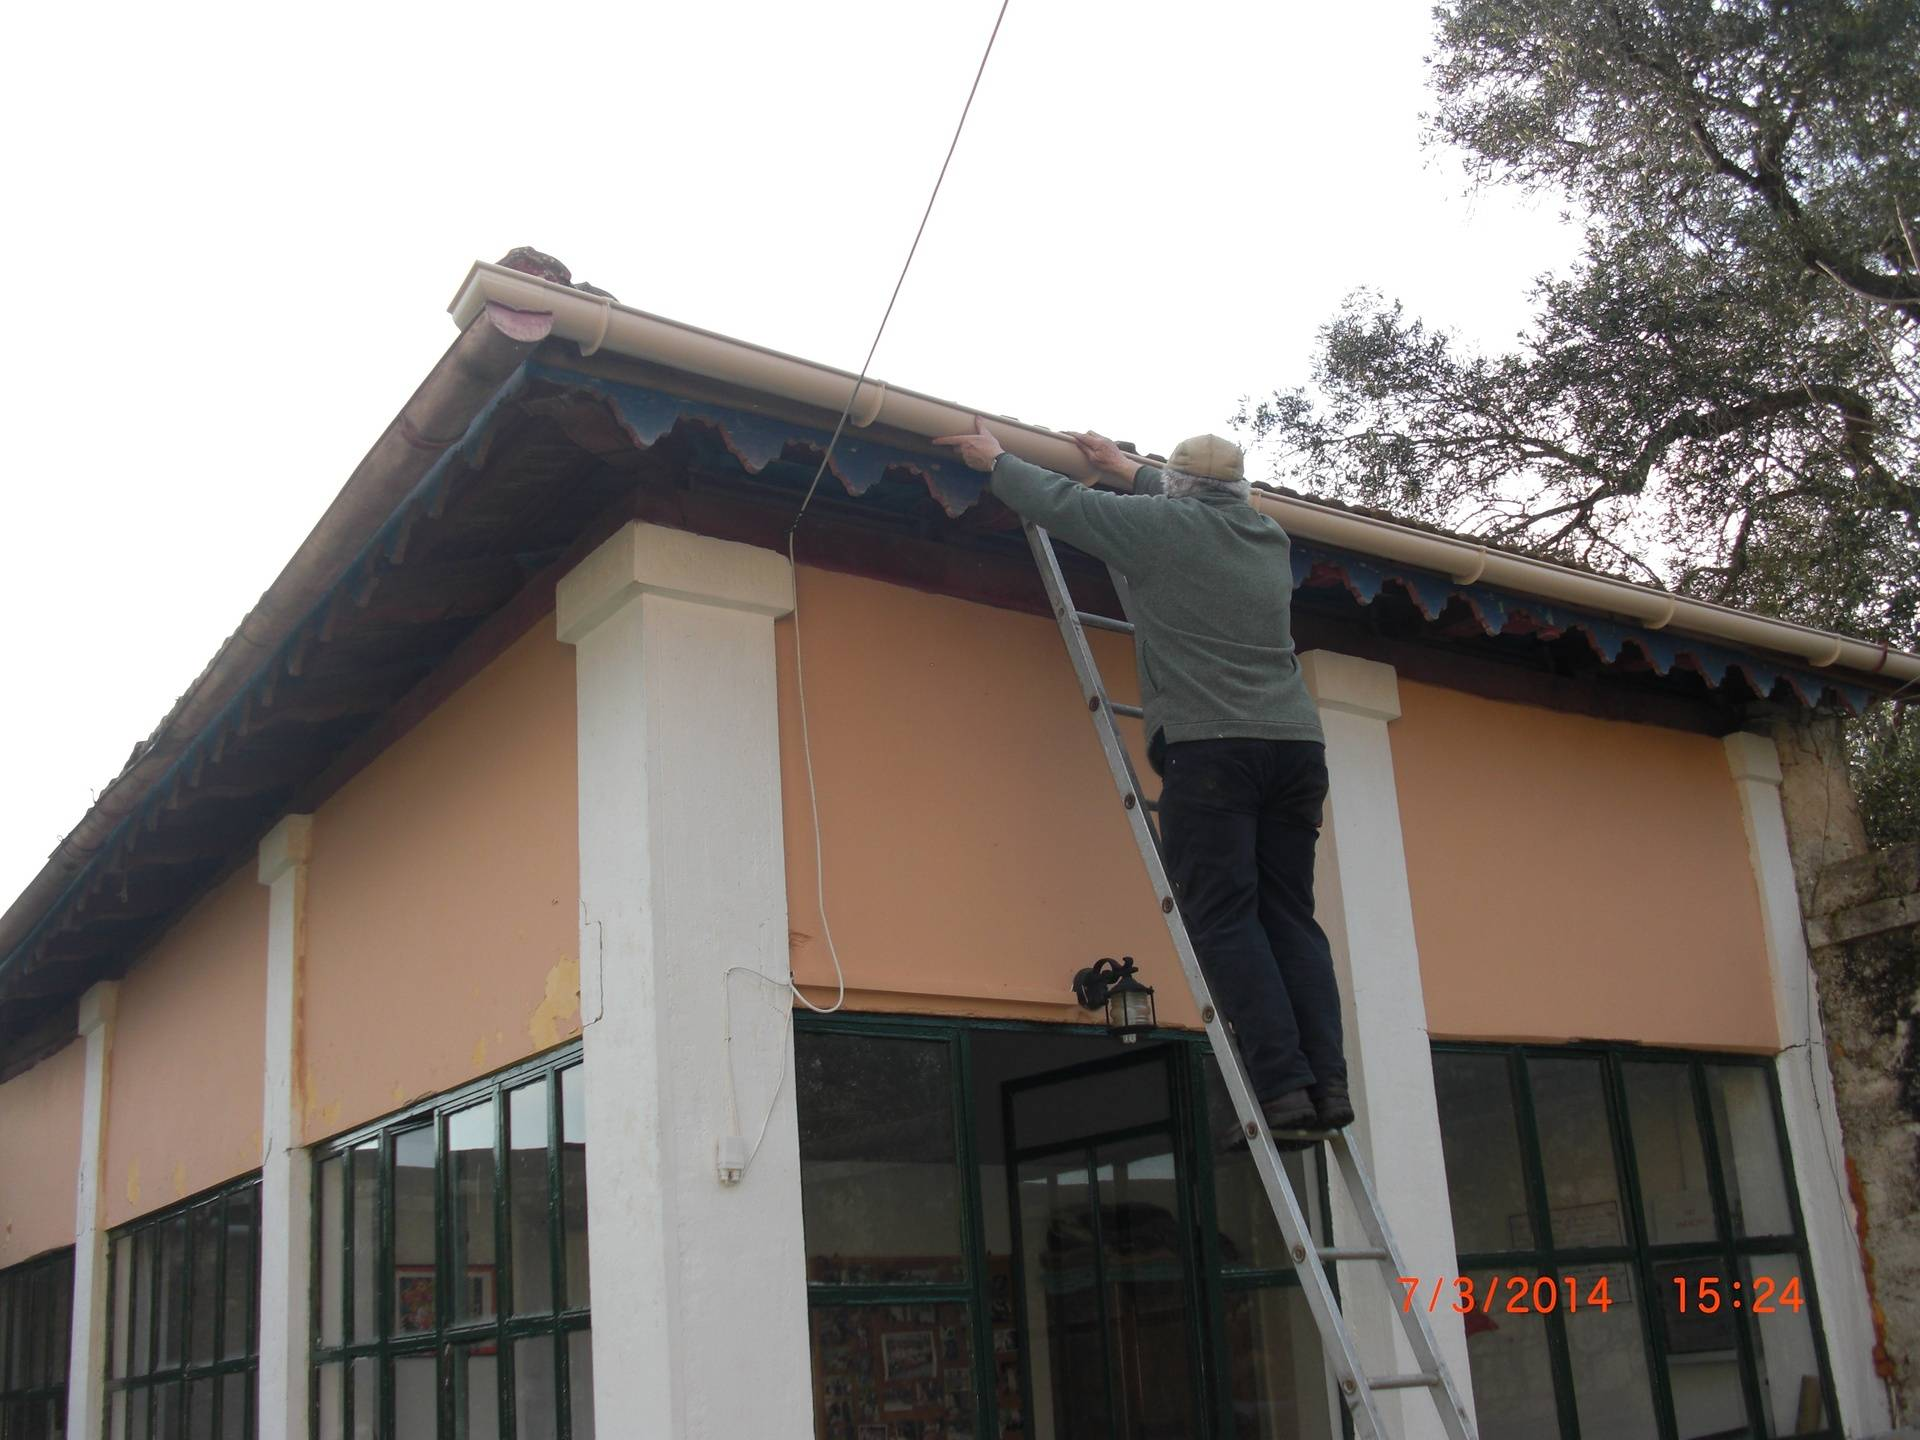 Rod repairing the guttering